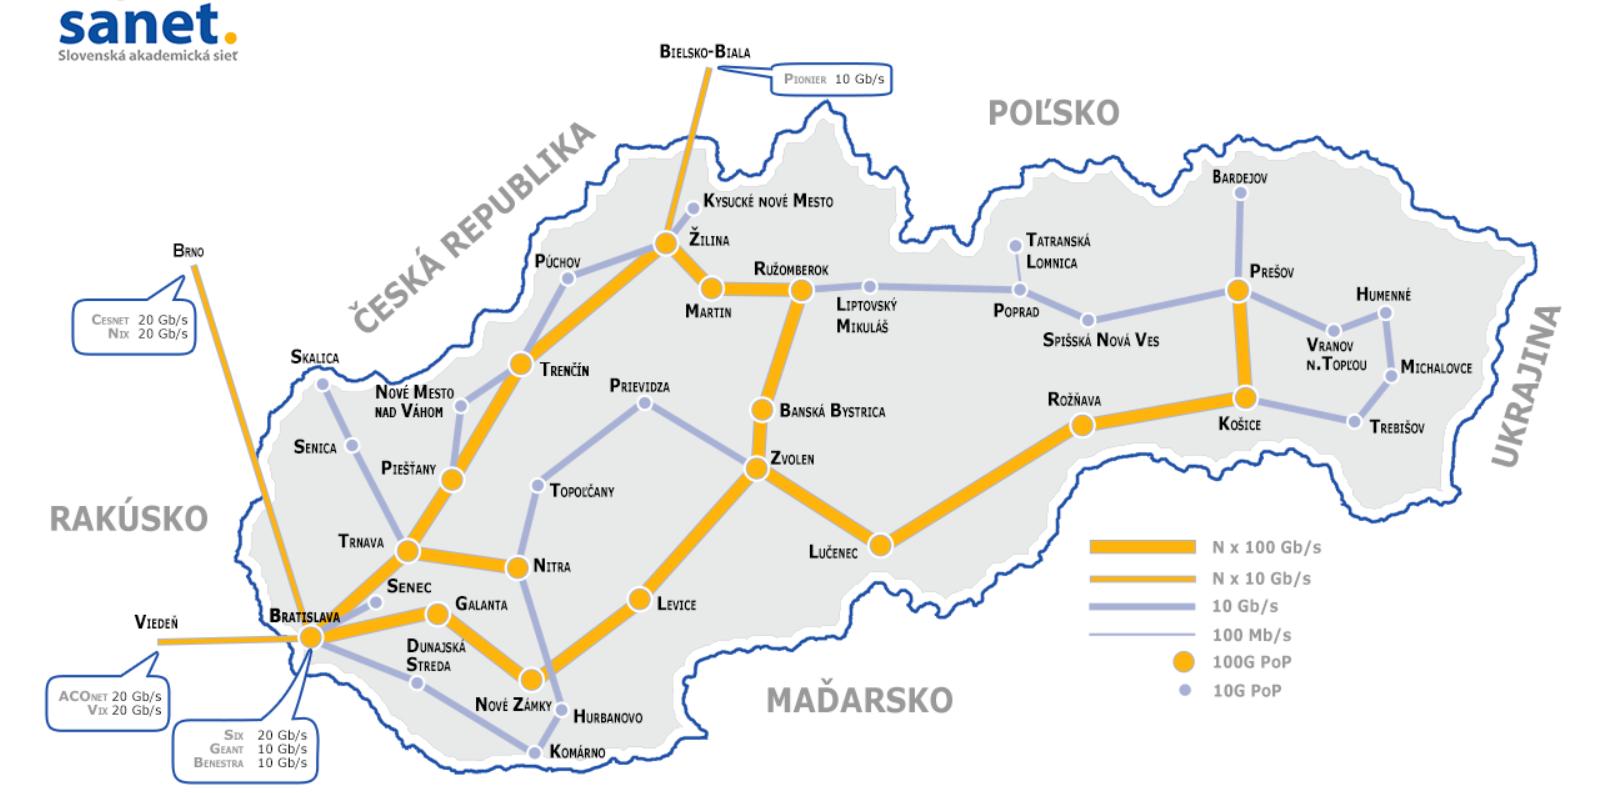 Mapa uzlov siete SANET